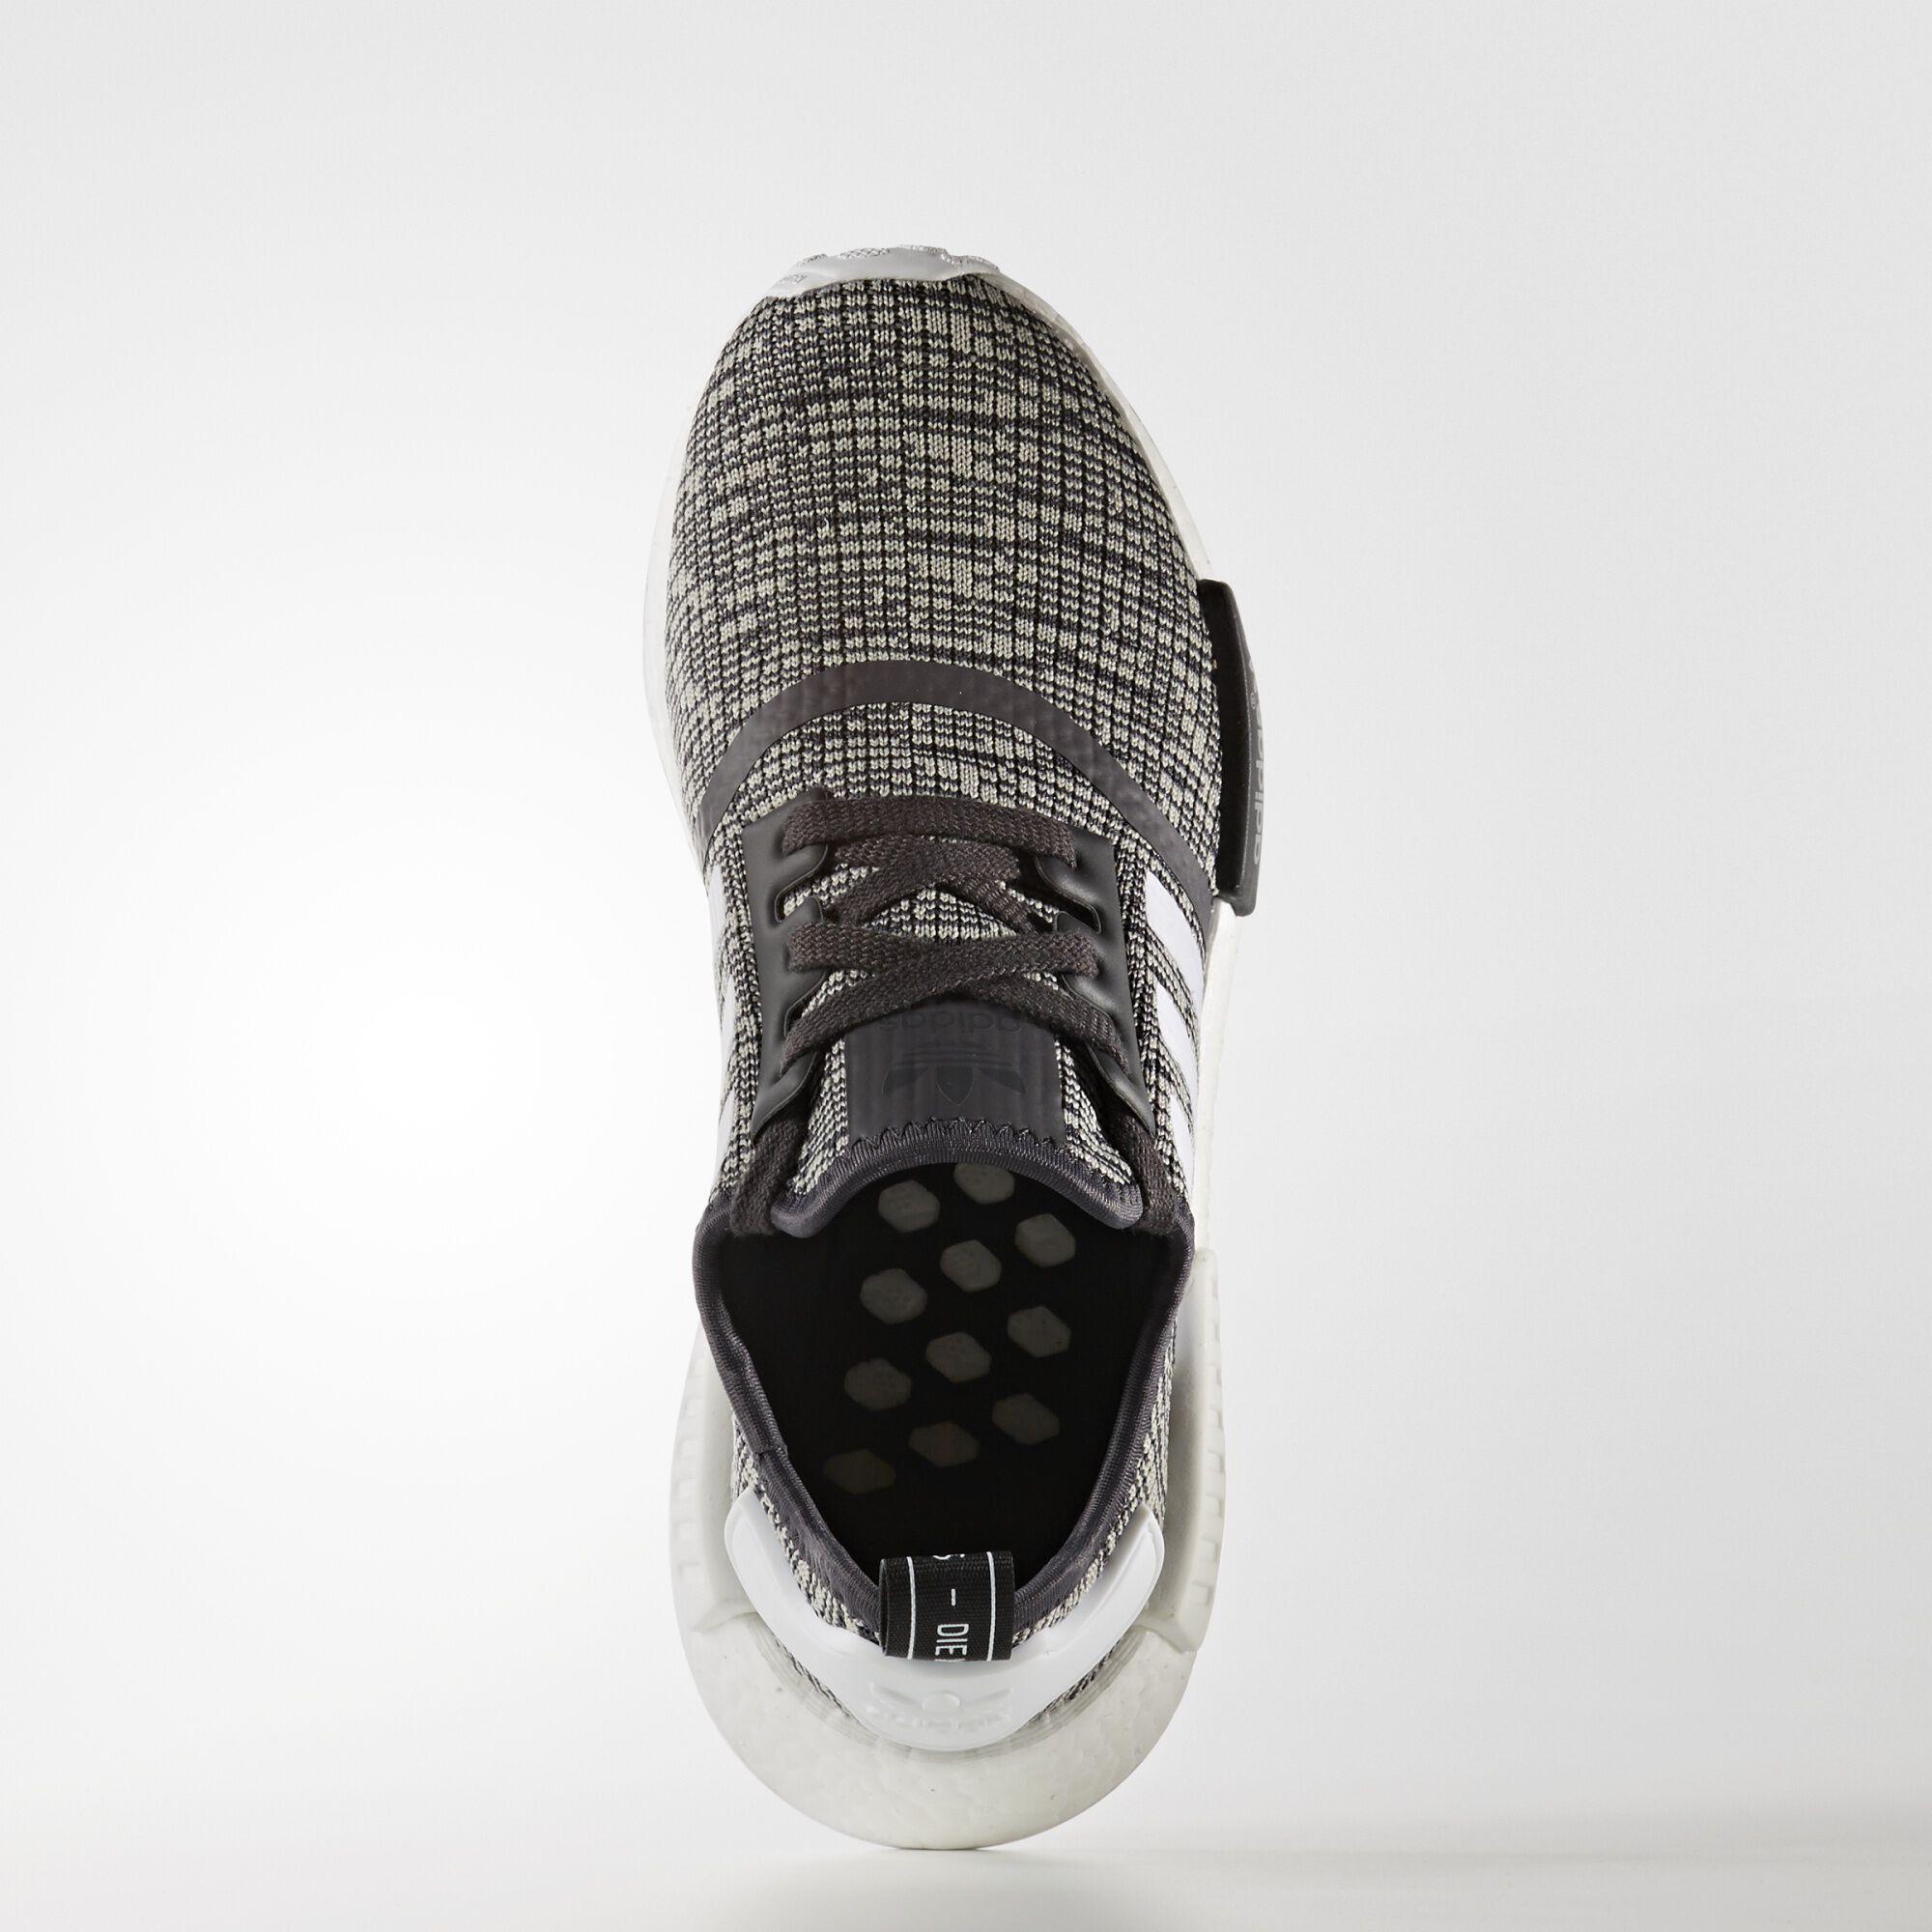 9518bd9dc adidas  Wmns NMD R1  Glitch  CW  Utility Black Running White Footwear White Multi  Solid Grey SKU  BY3035 Release  04.06.17. Retail   130